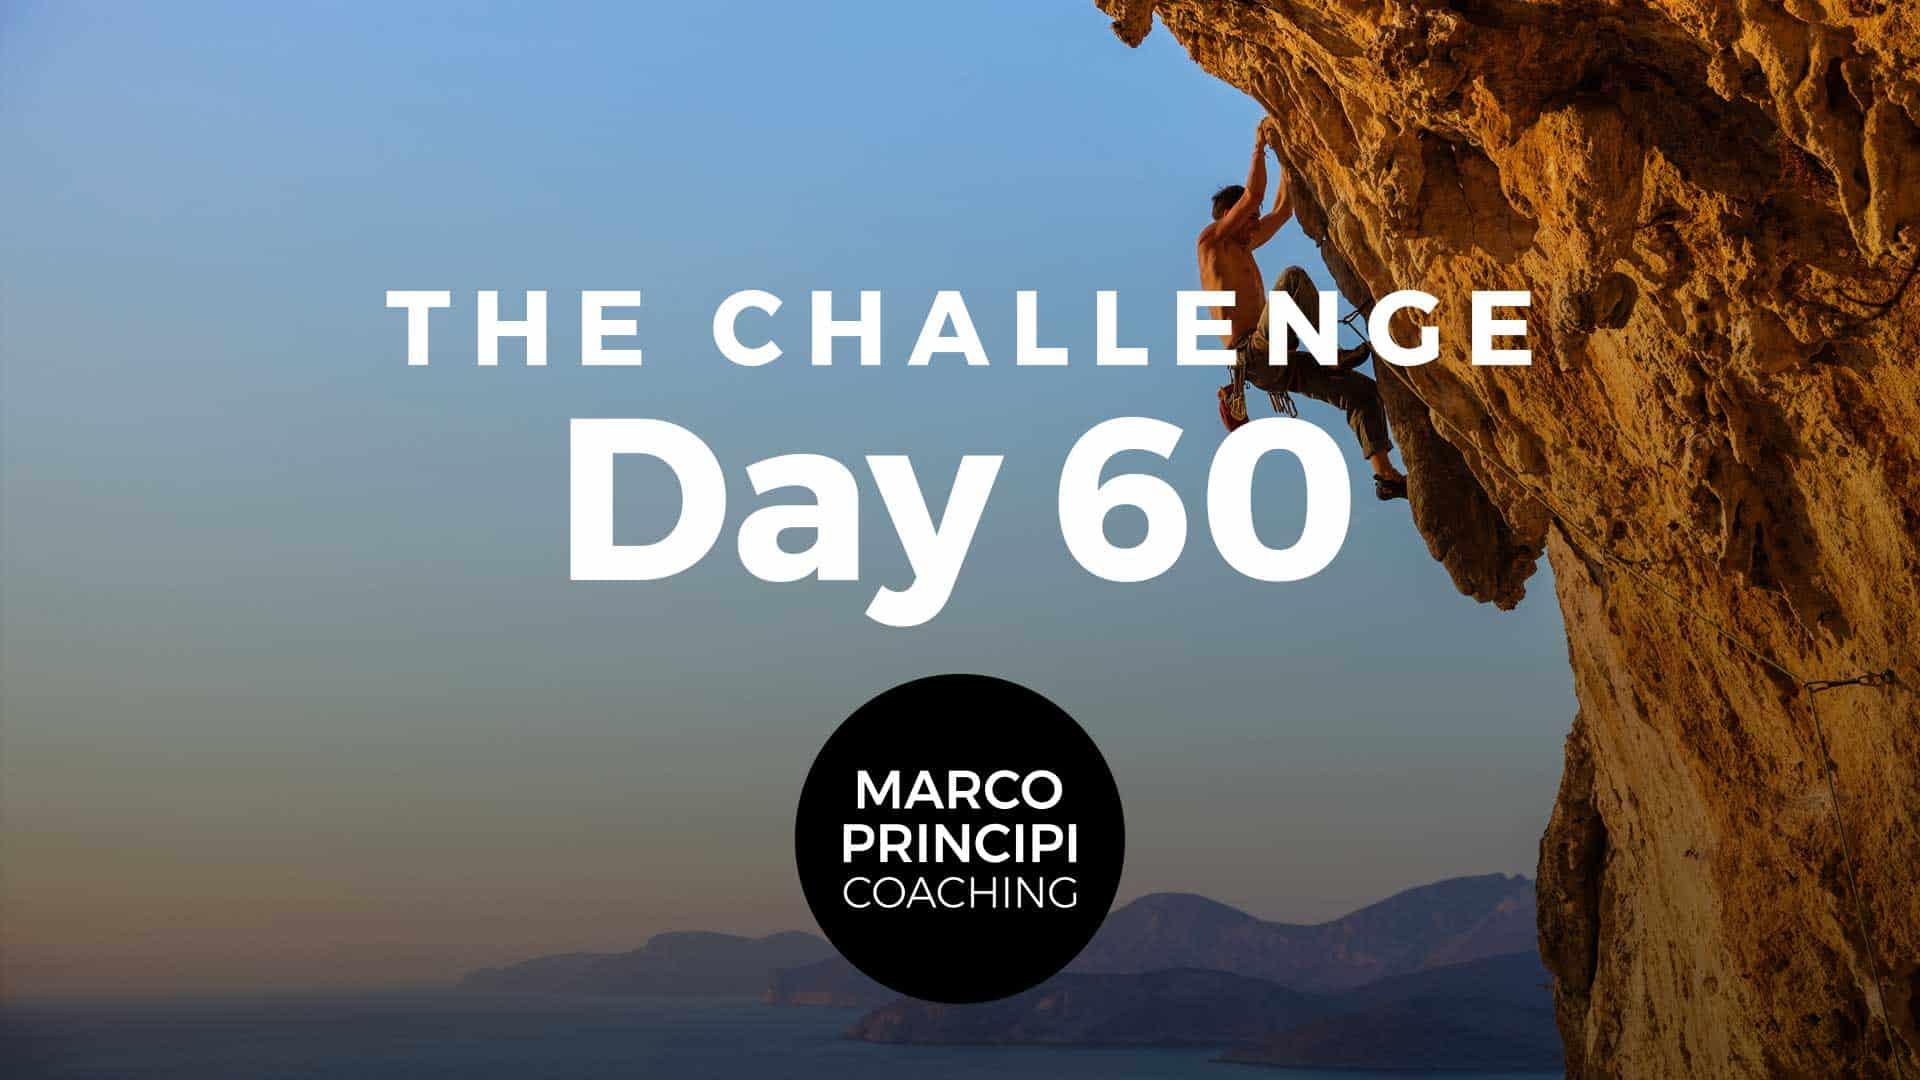 Marco Principi The Challenge Day 60